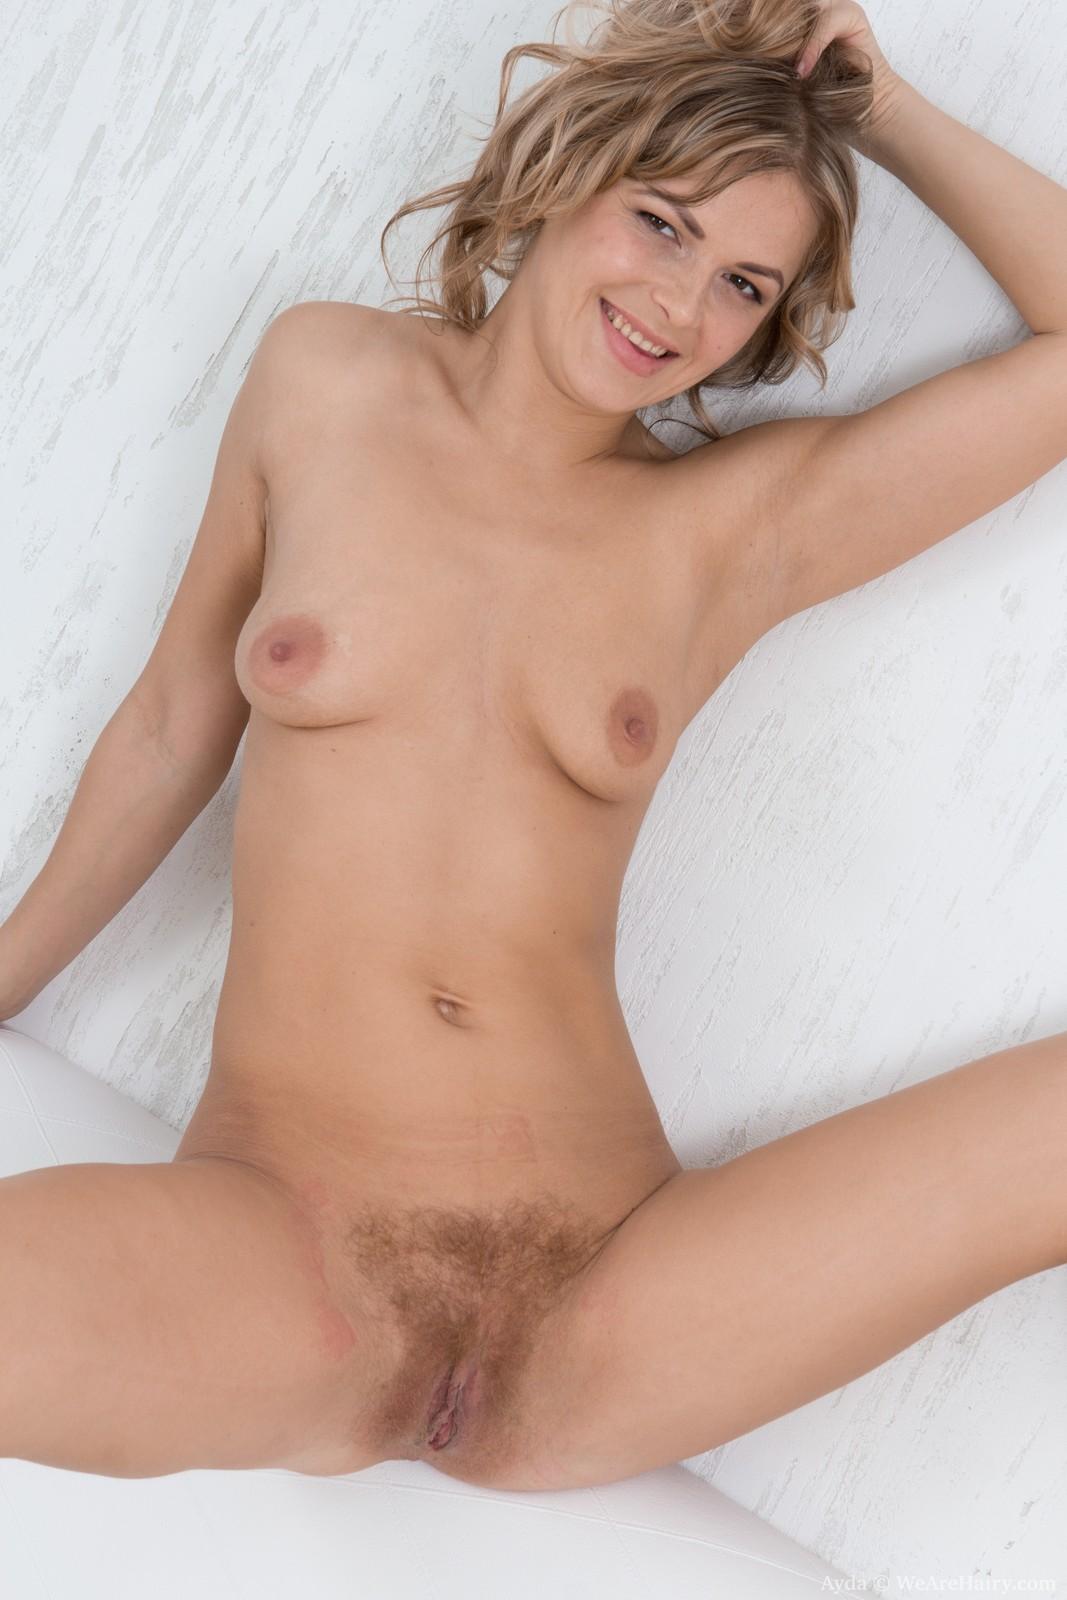 Hirsute nudes